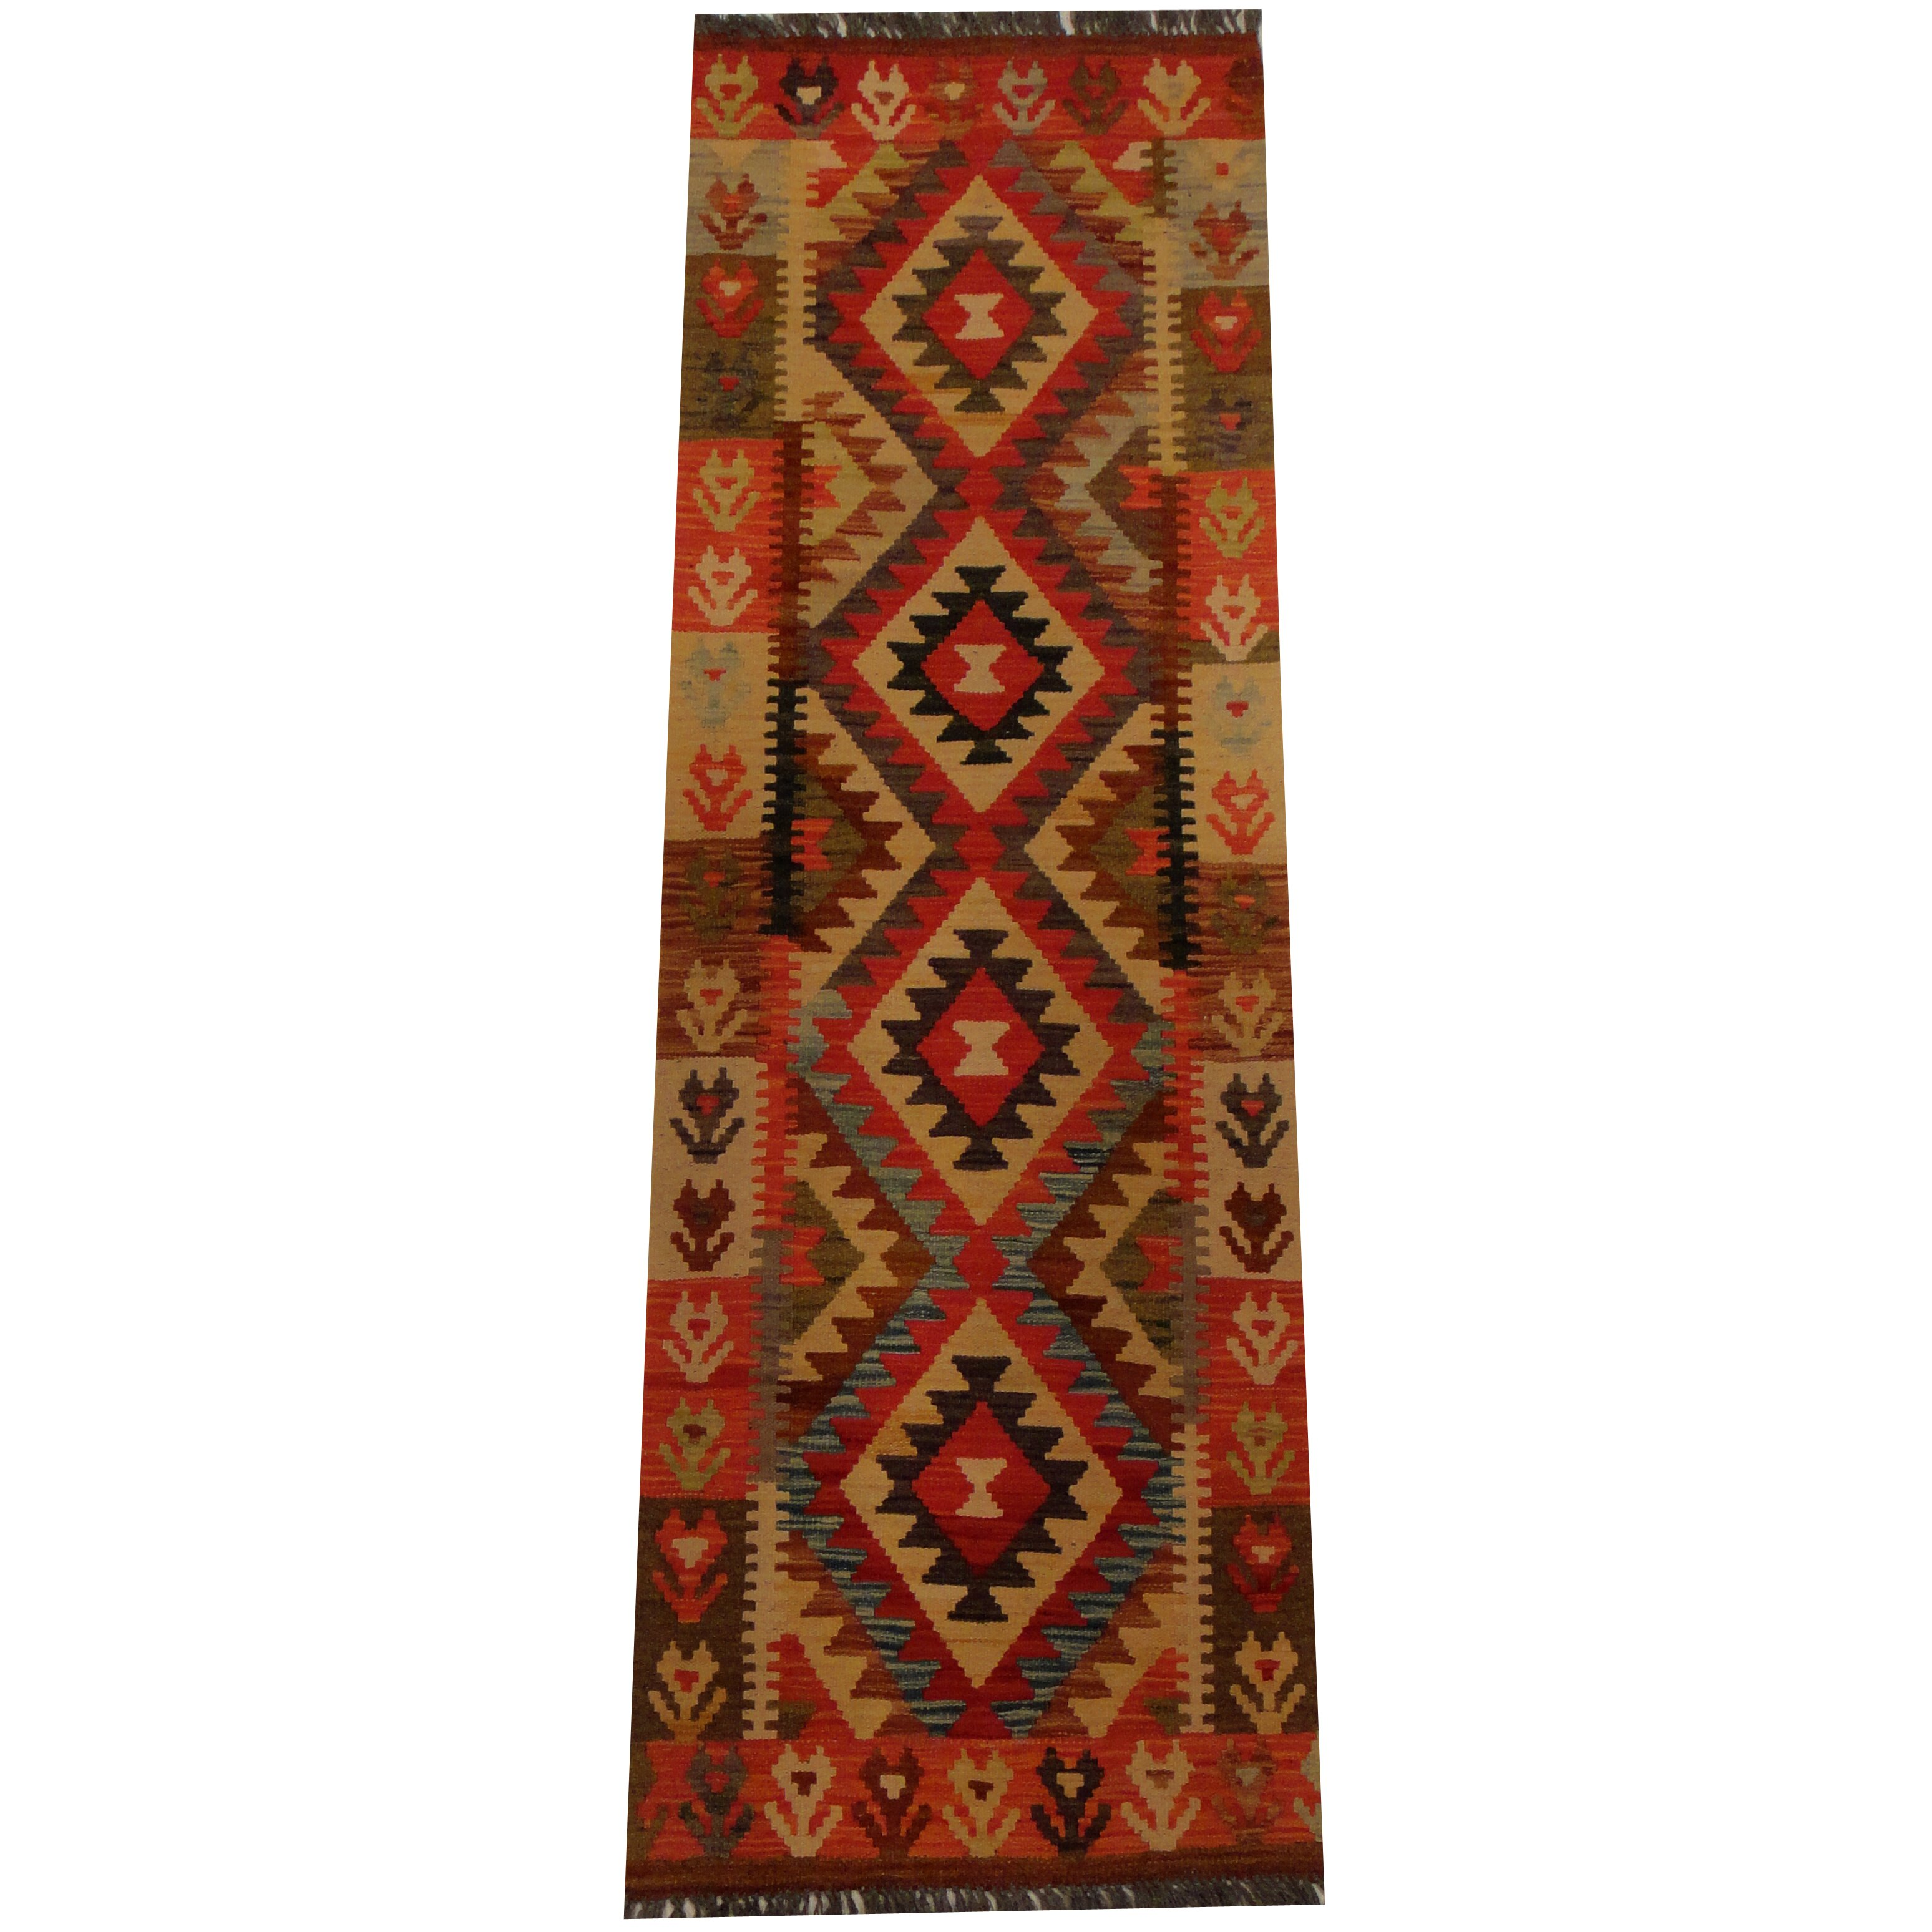 Camel Wool Rug Persian Rug Handwoven Kilim Area: Herat Oriental Kilim Hand-Woven Rust Area Rug